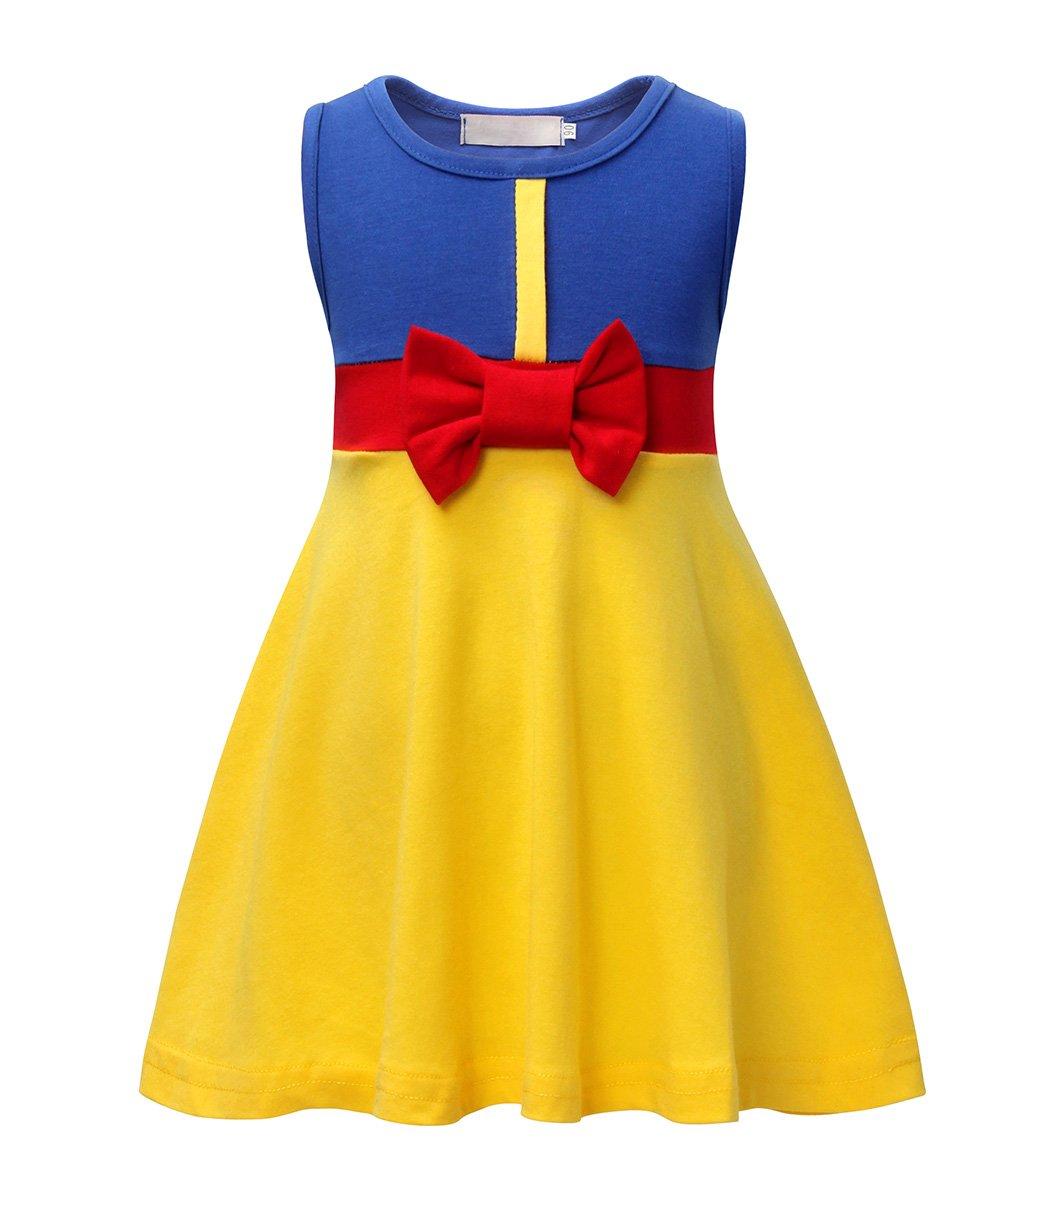 Jurebecia Toddler Girls Snow White Dress for Halloween Costume Girls Princess Fancy Dress Size 2T